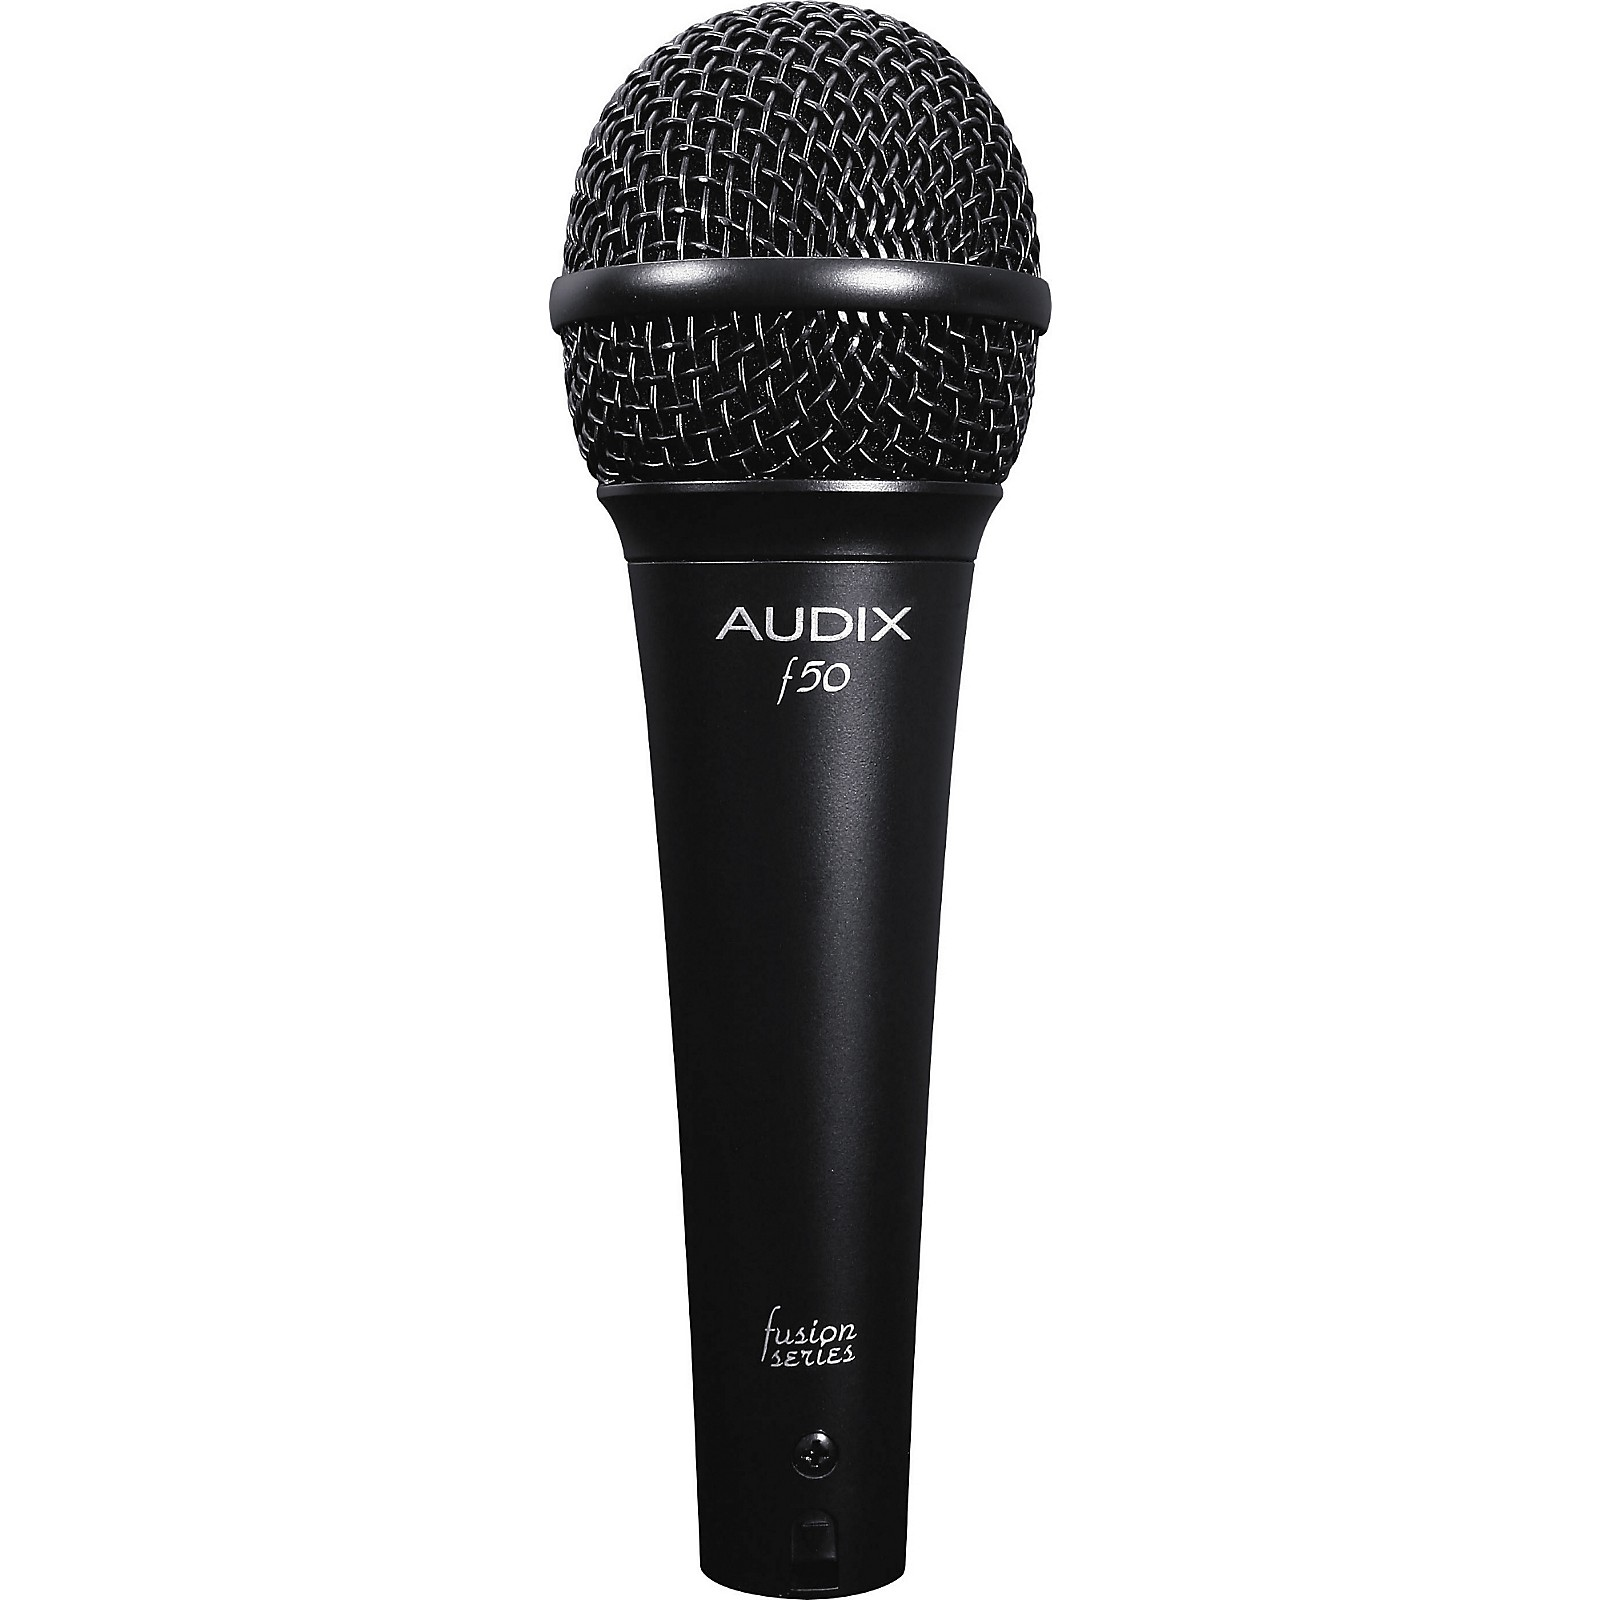 Audix F50 Dynamic Vocal Microphone